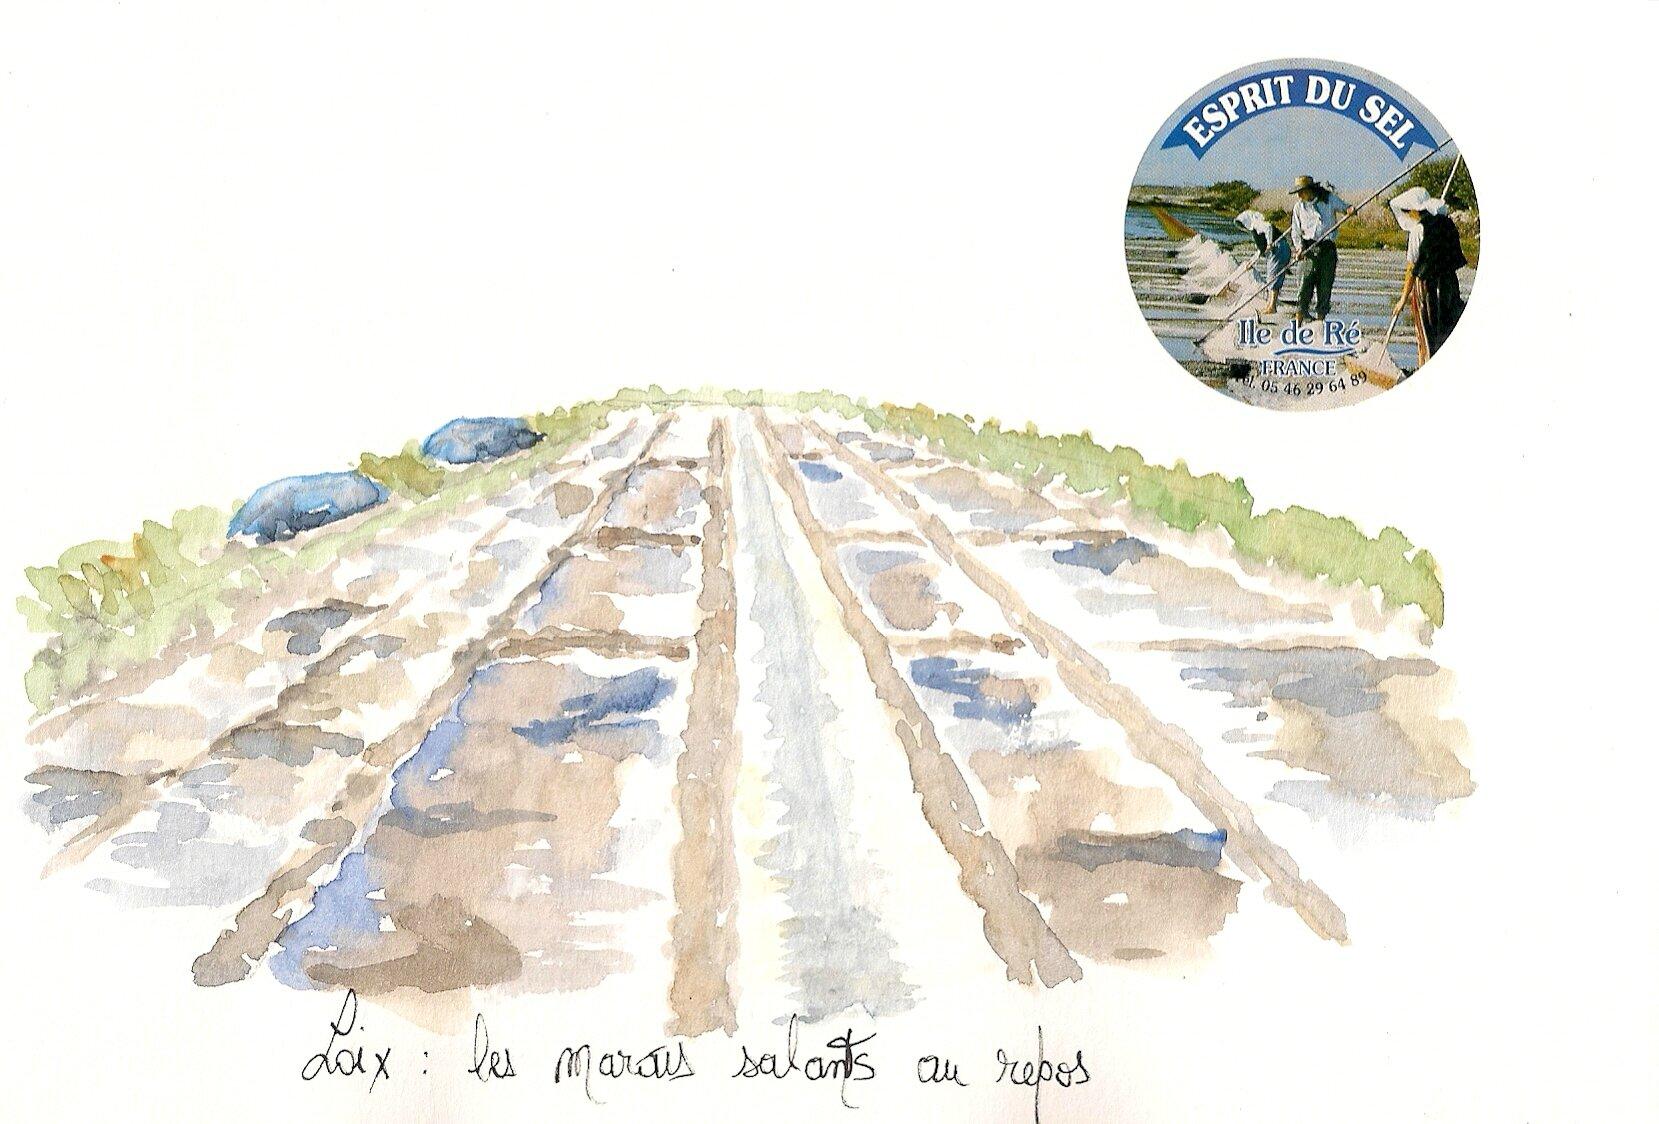 Loix : les marais salants